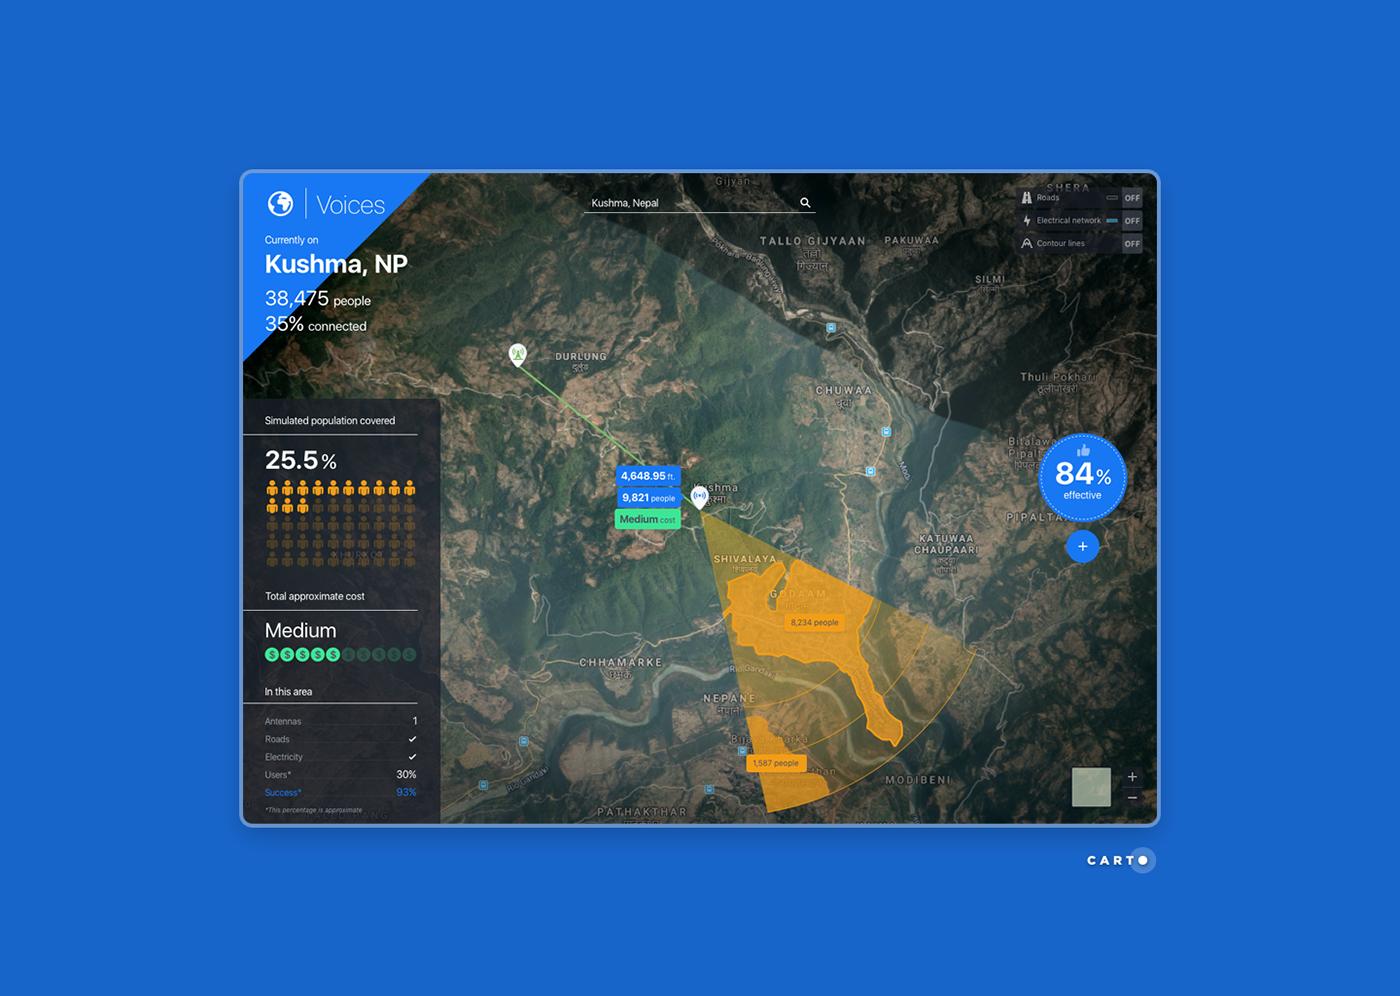 Image may contain: screenshot, map and aerial